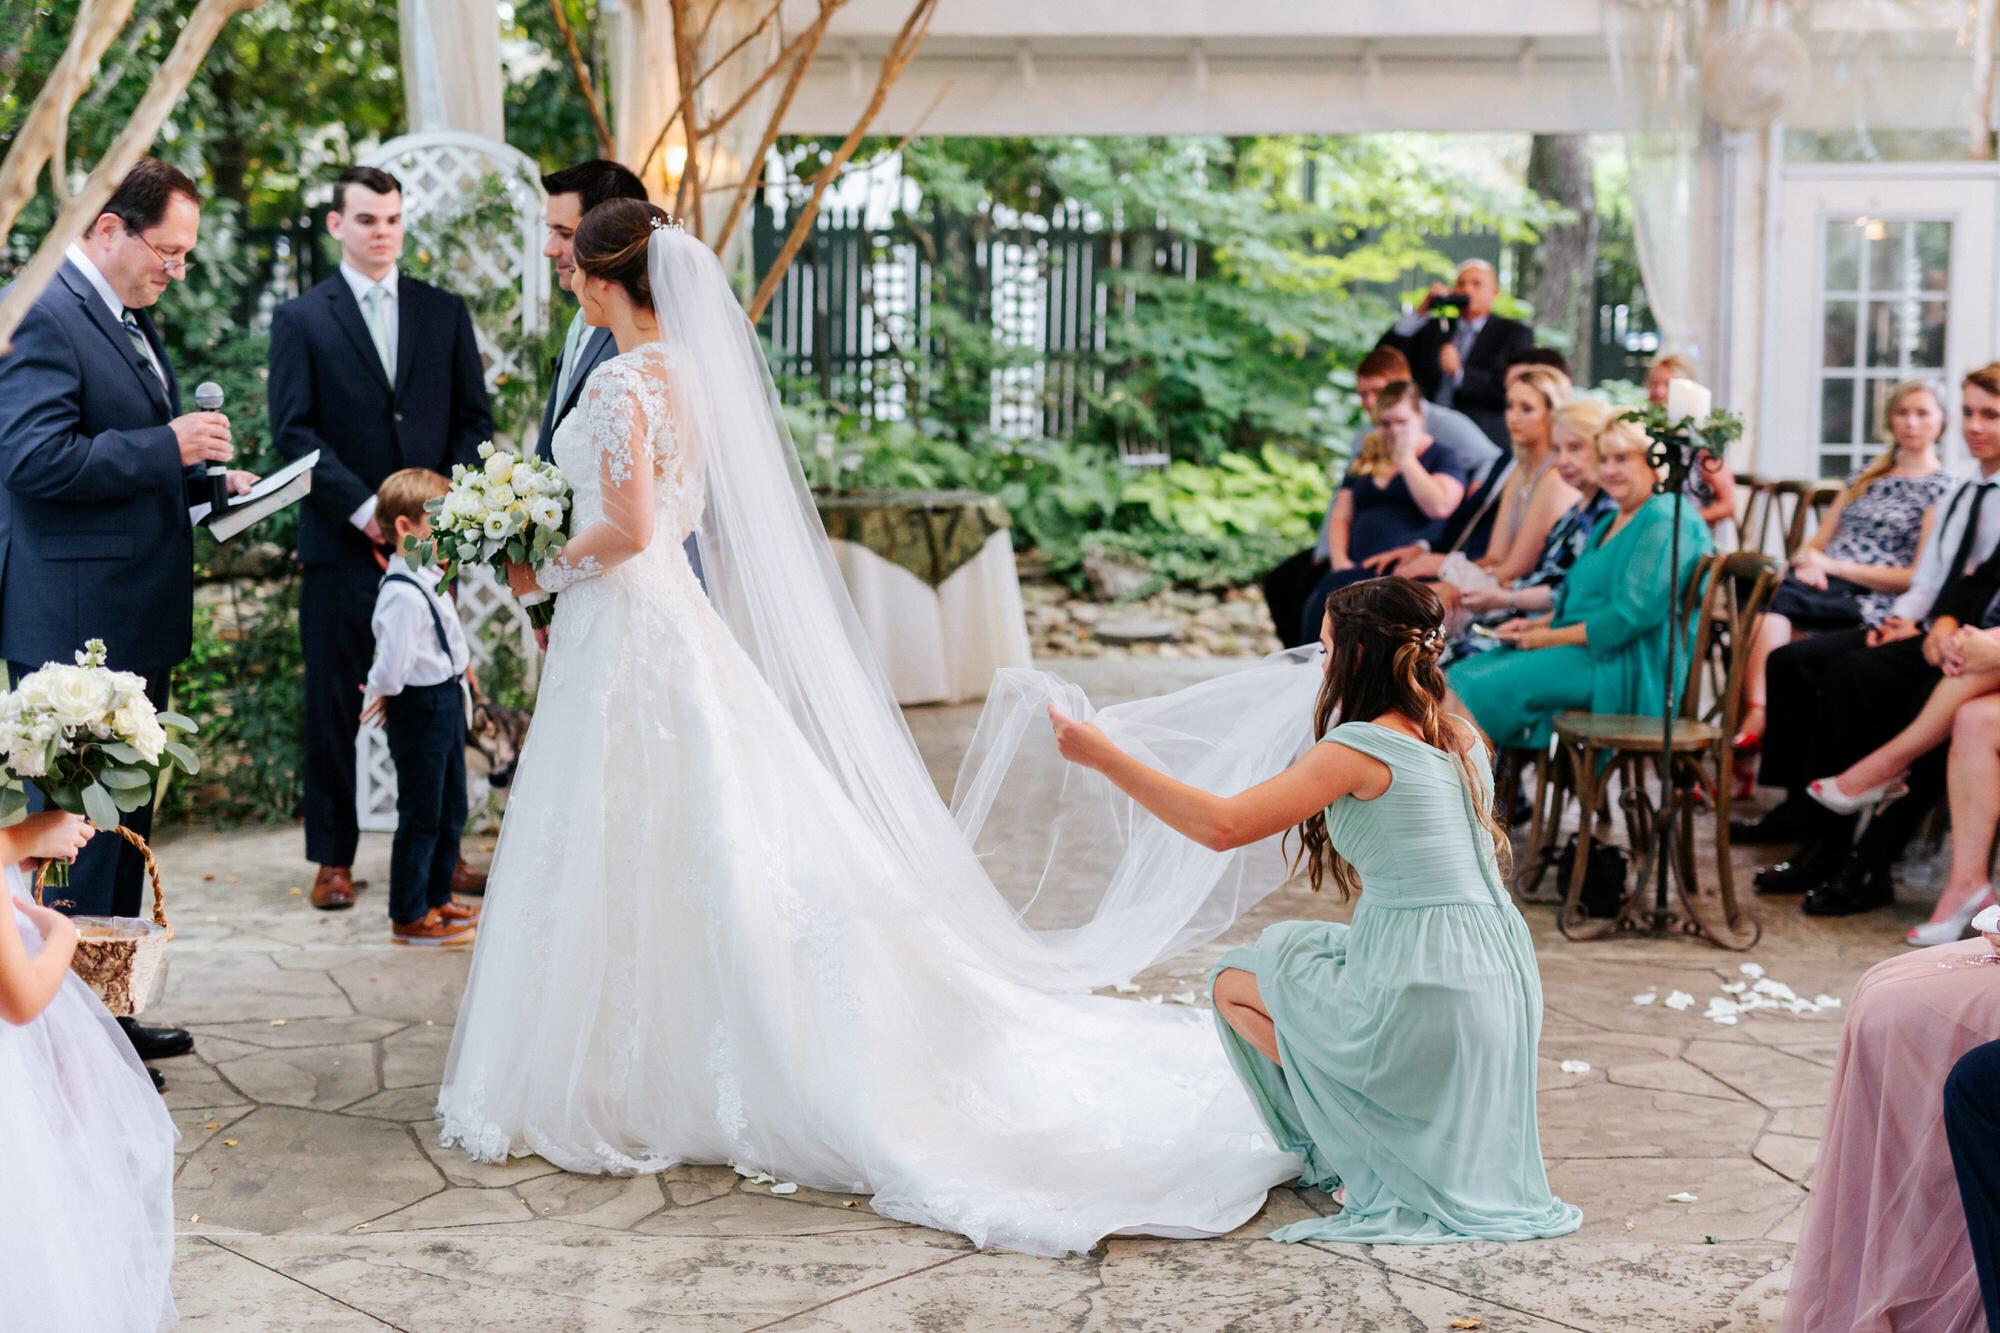 twigs-tempietto-wedding-greenville-downtown-344.JPG